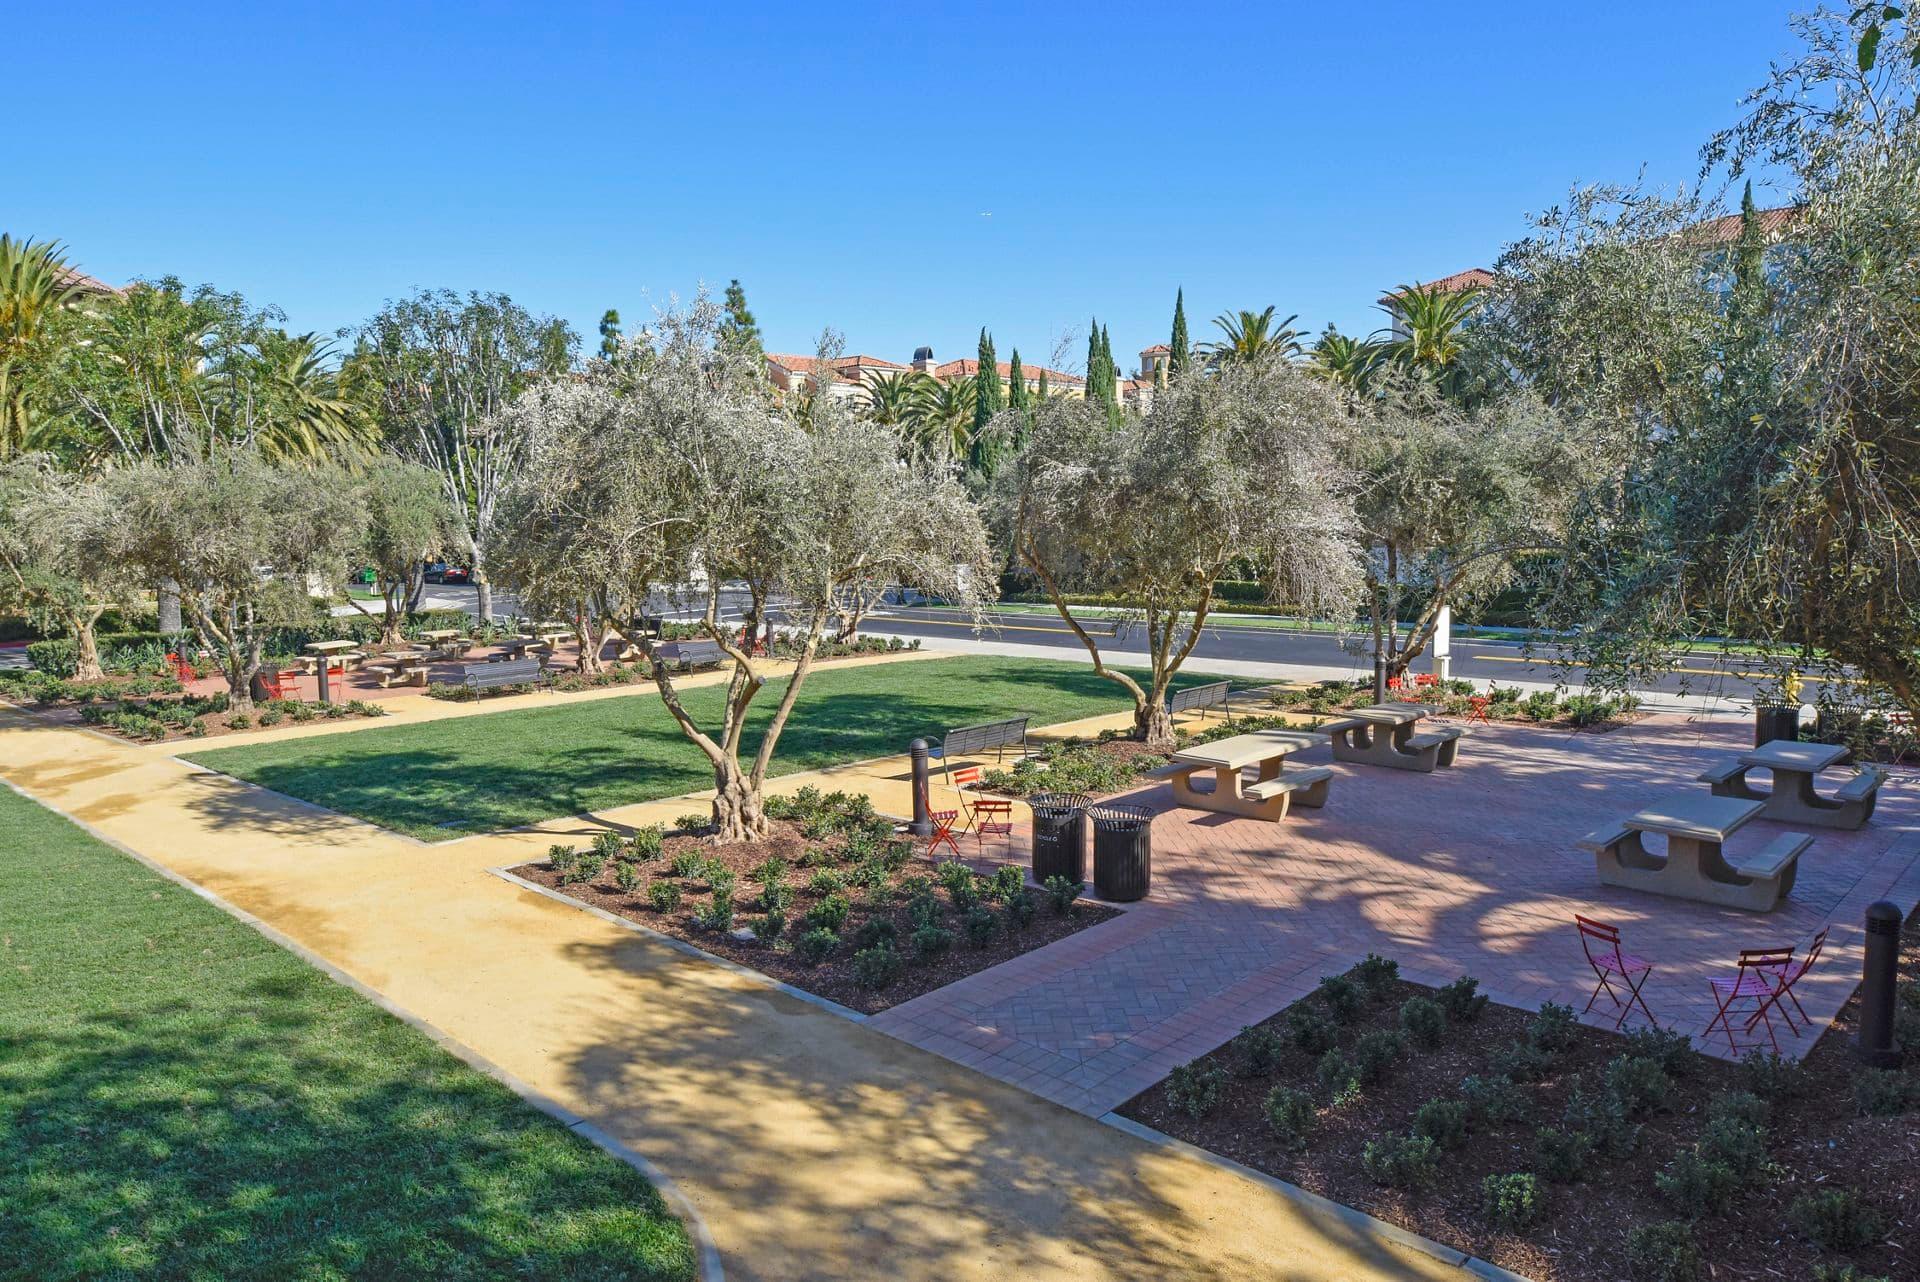 Exterior view of Moitozo Park at North Park Apartment Homes in San Jose, CA.